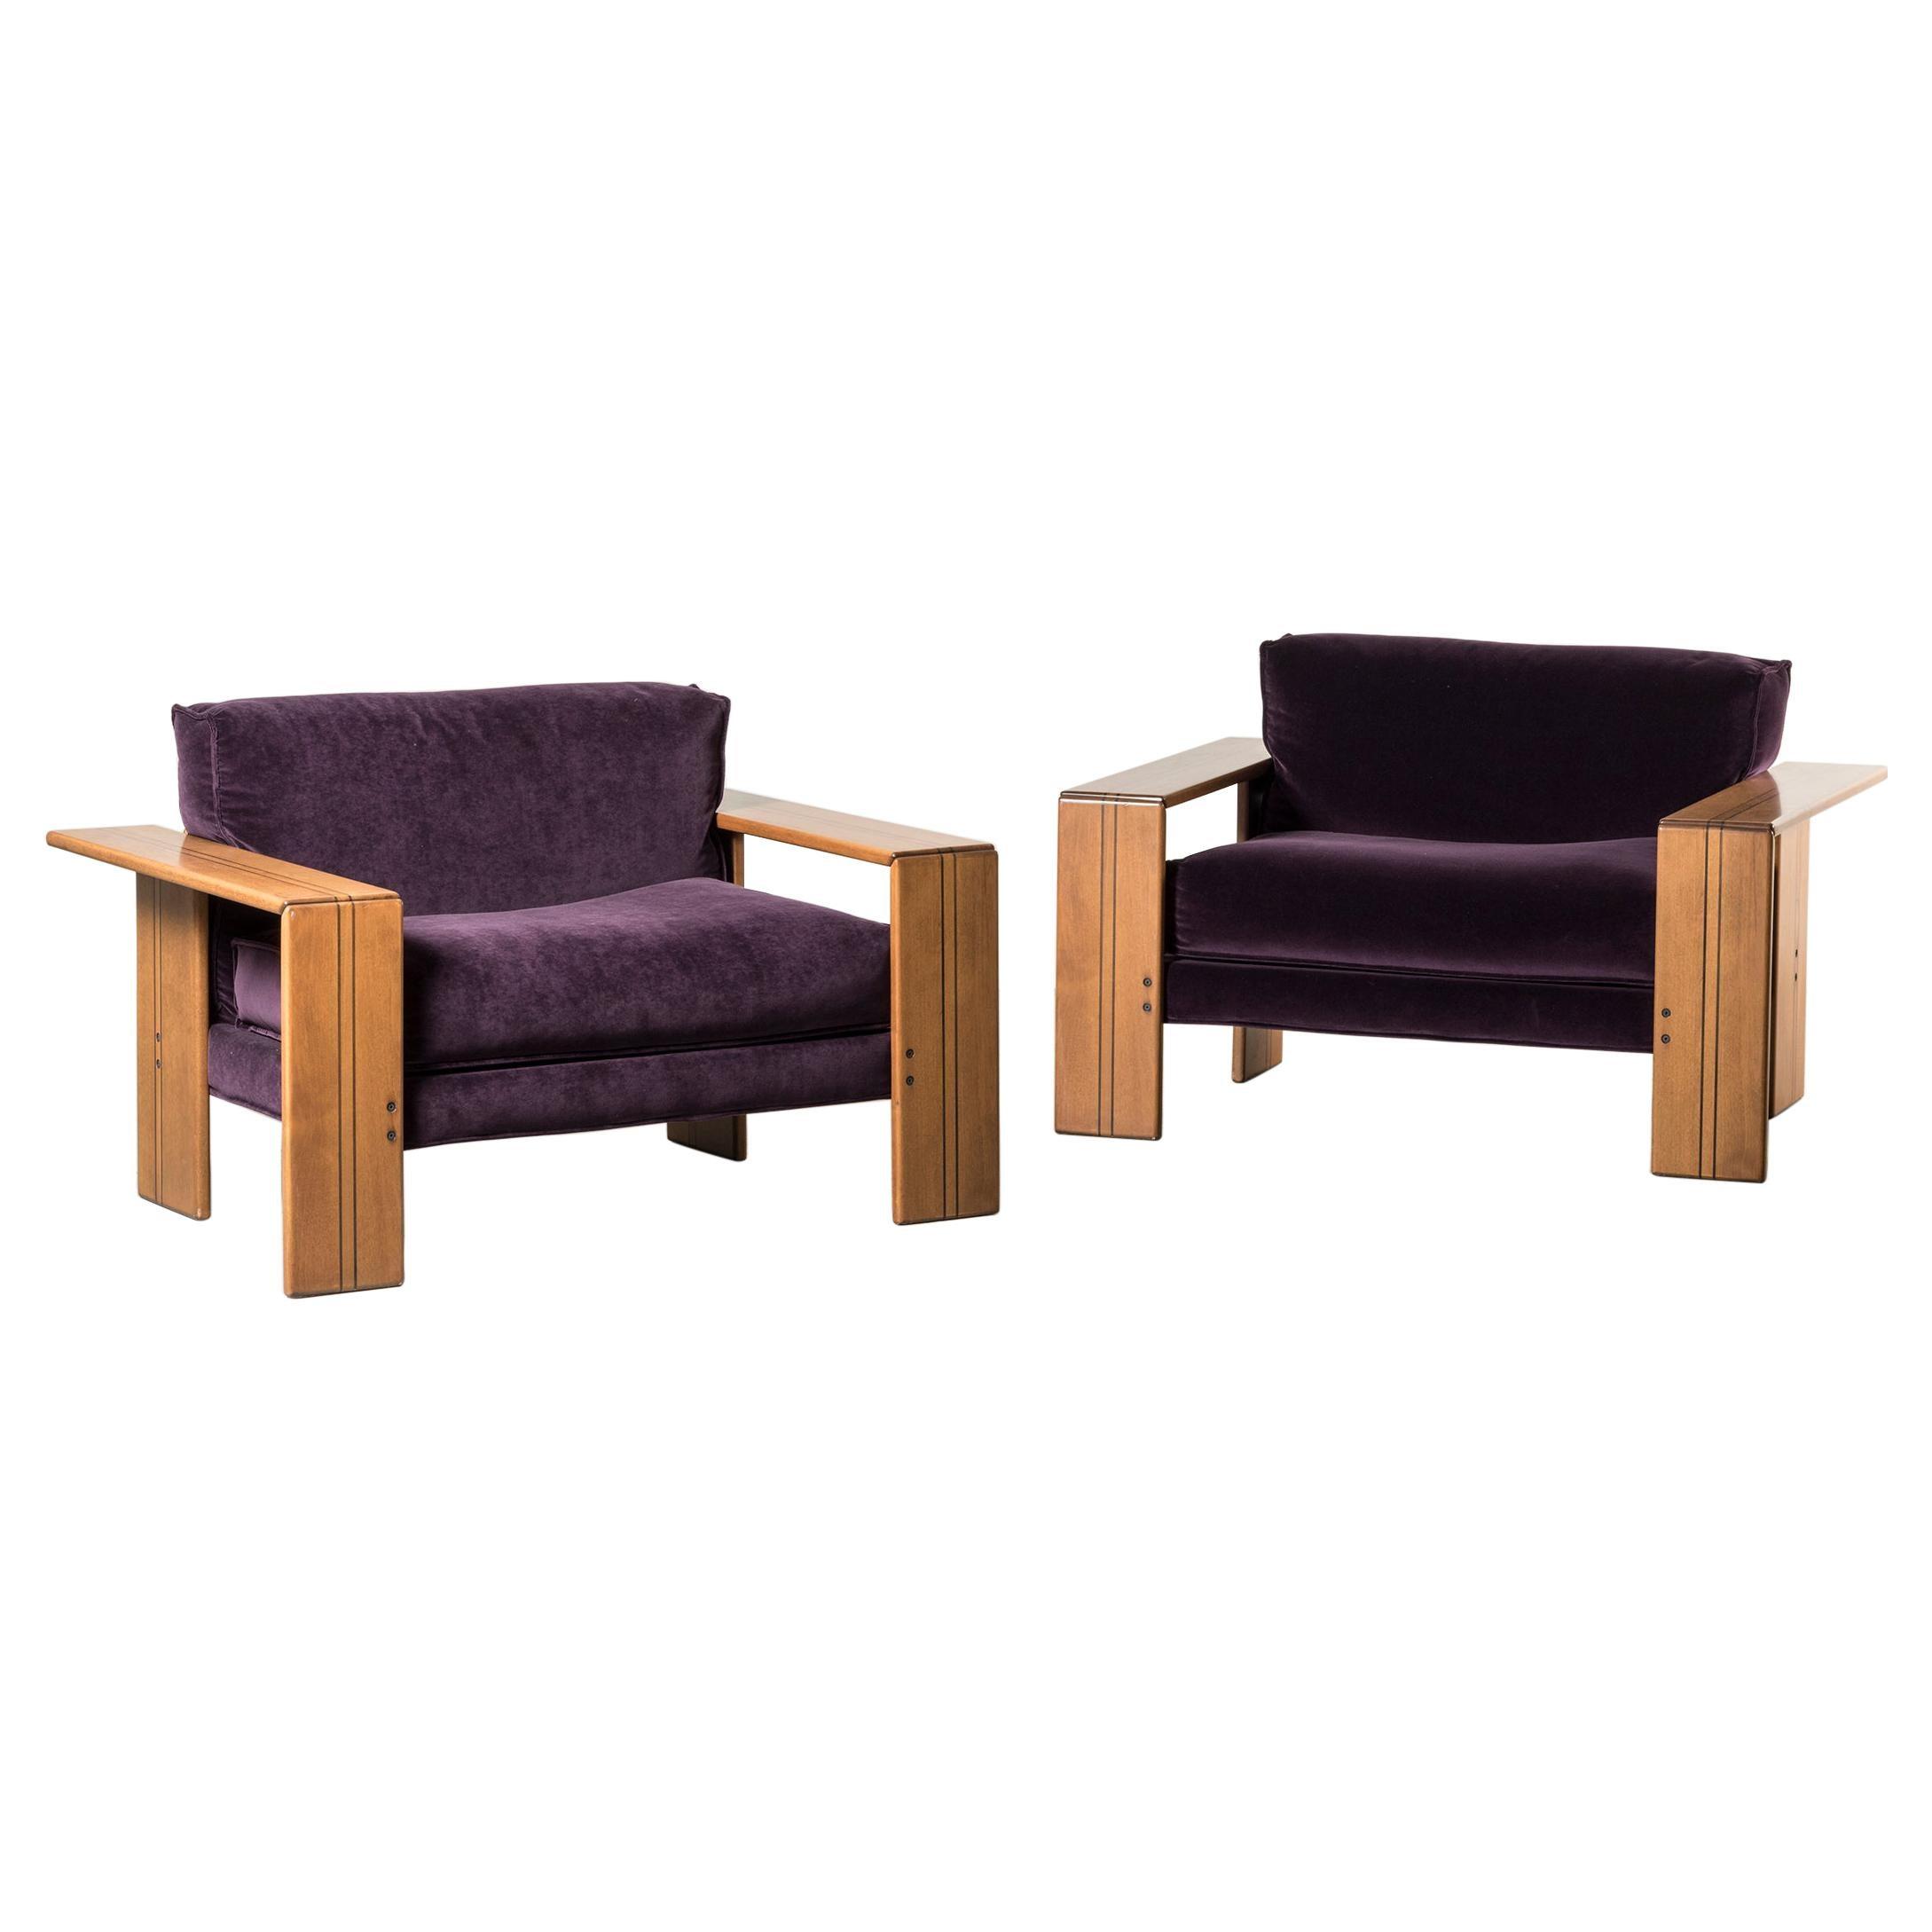 Pair of Armchairs, Artona Series, by Afra & Tobia Scarpa